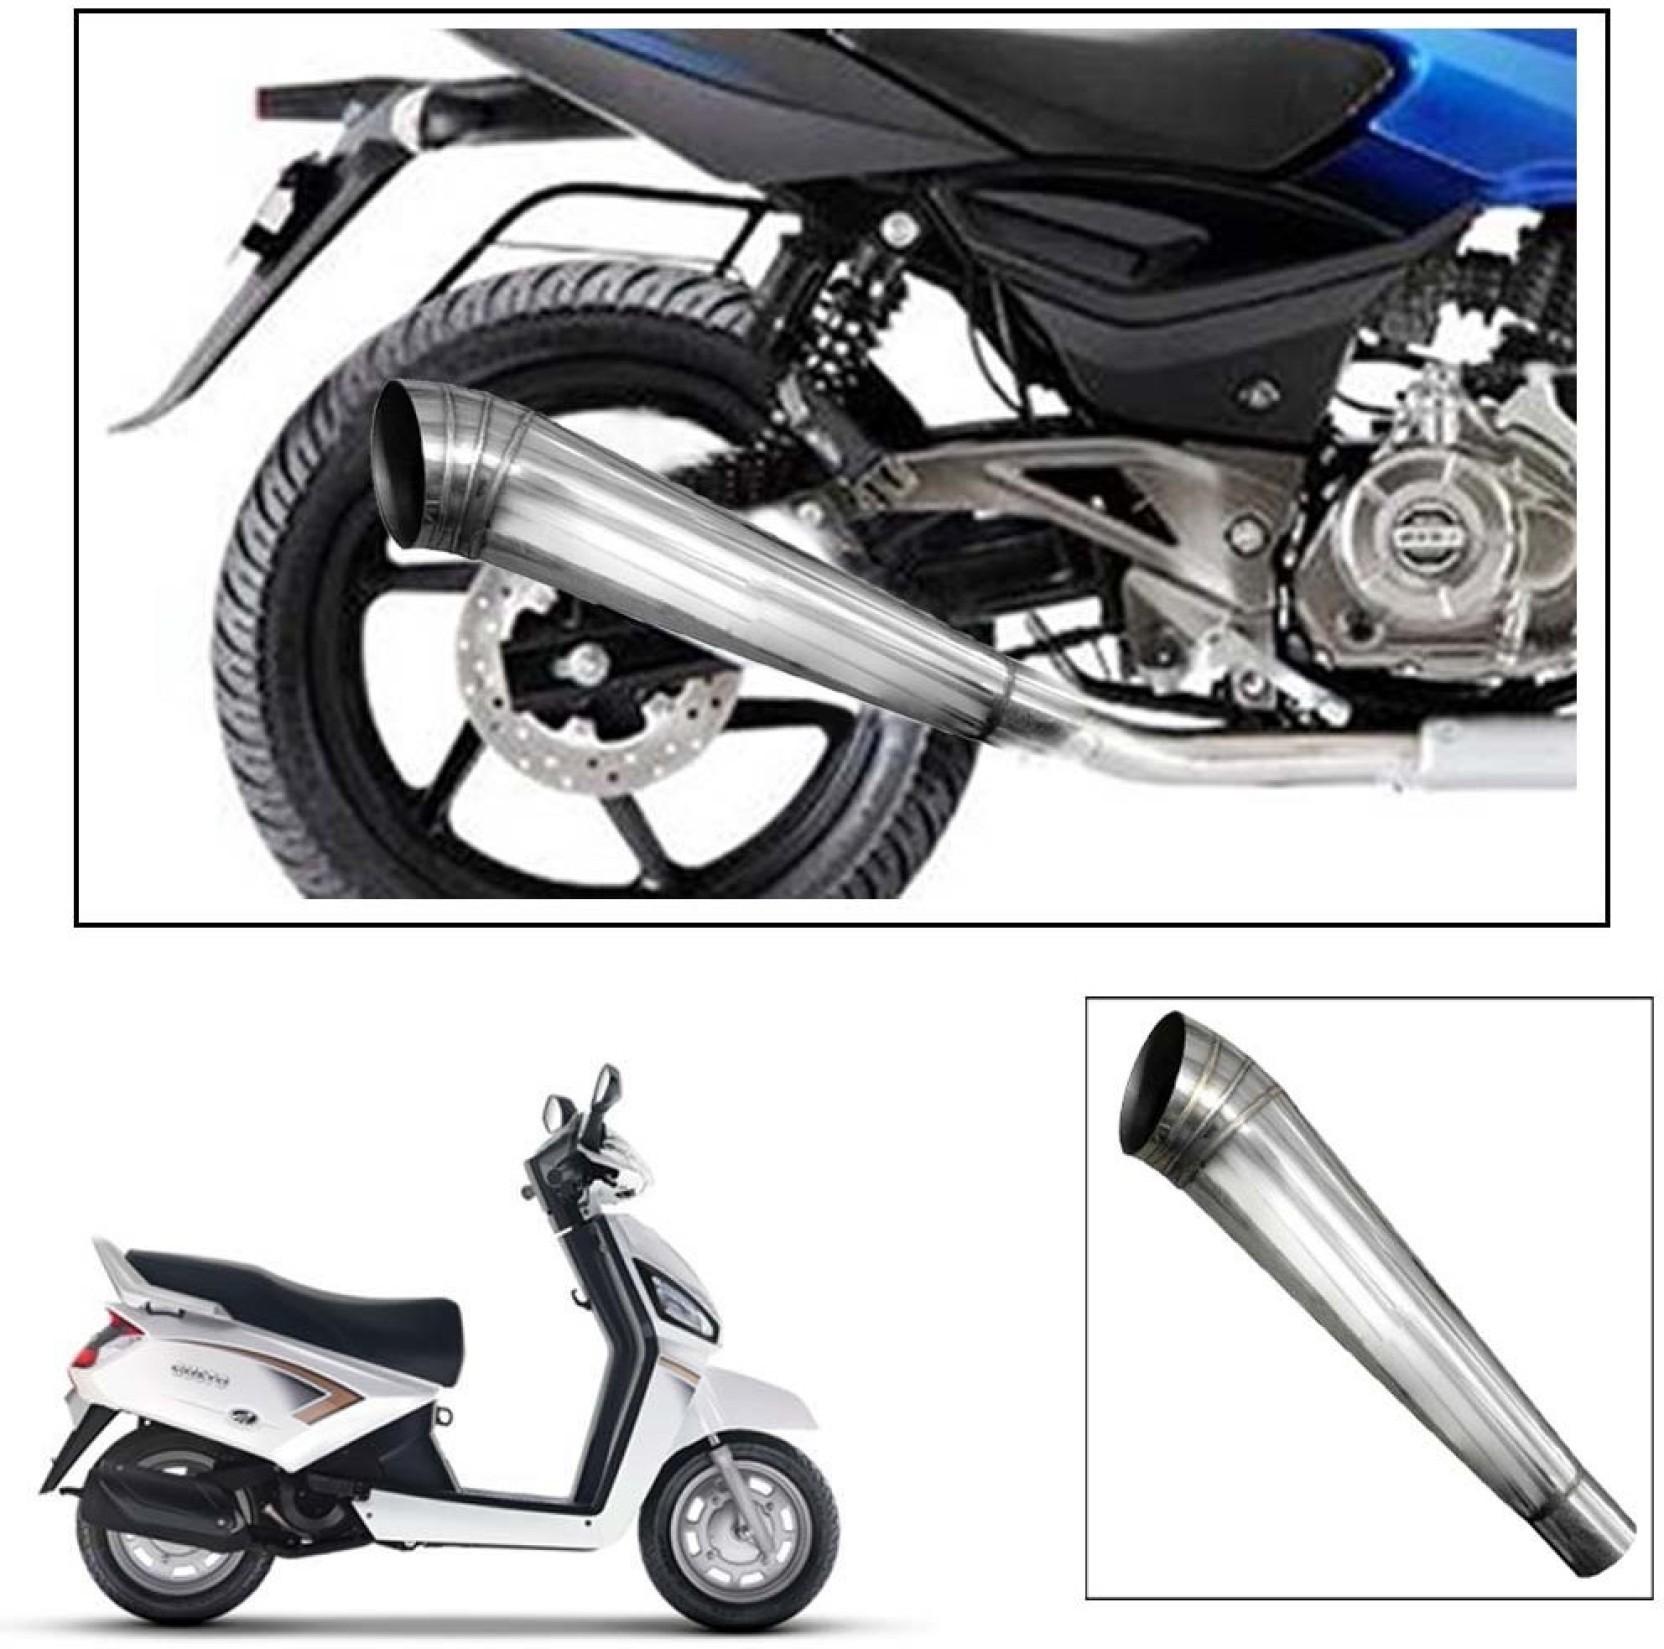 Vheelocityin Honda Dio Slip On Exhaust System Price In India Buy Bike Stickers Design Add To Cart